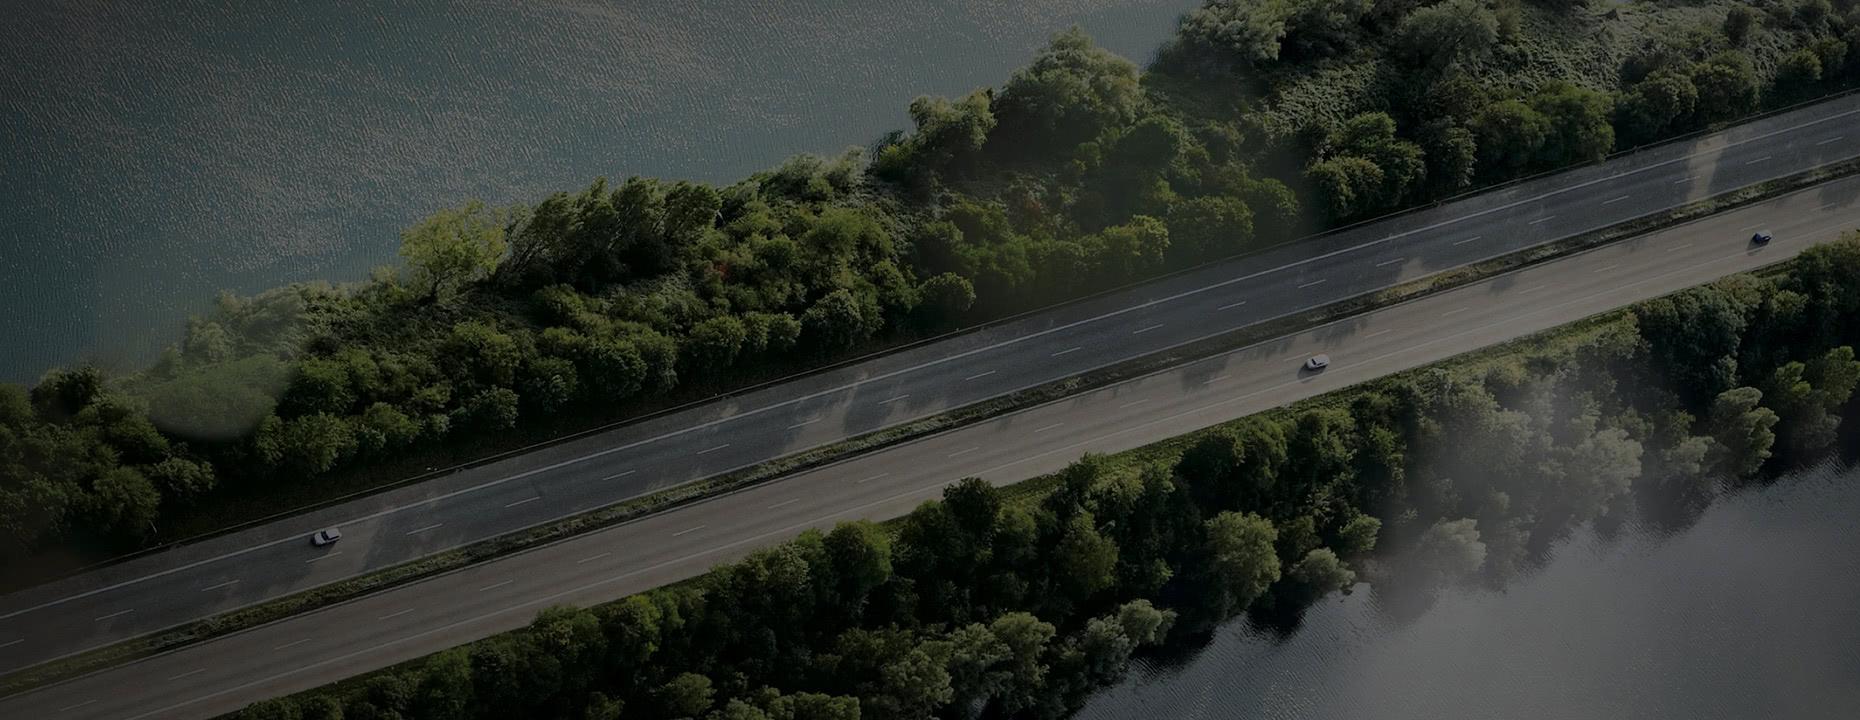 Поради з автостради #3 | БУГ АВТО - фото 7